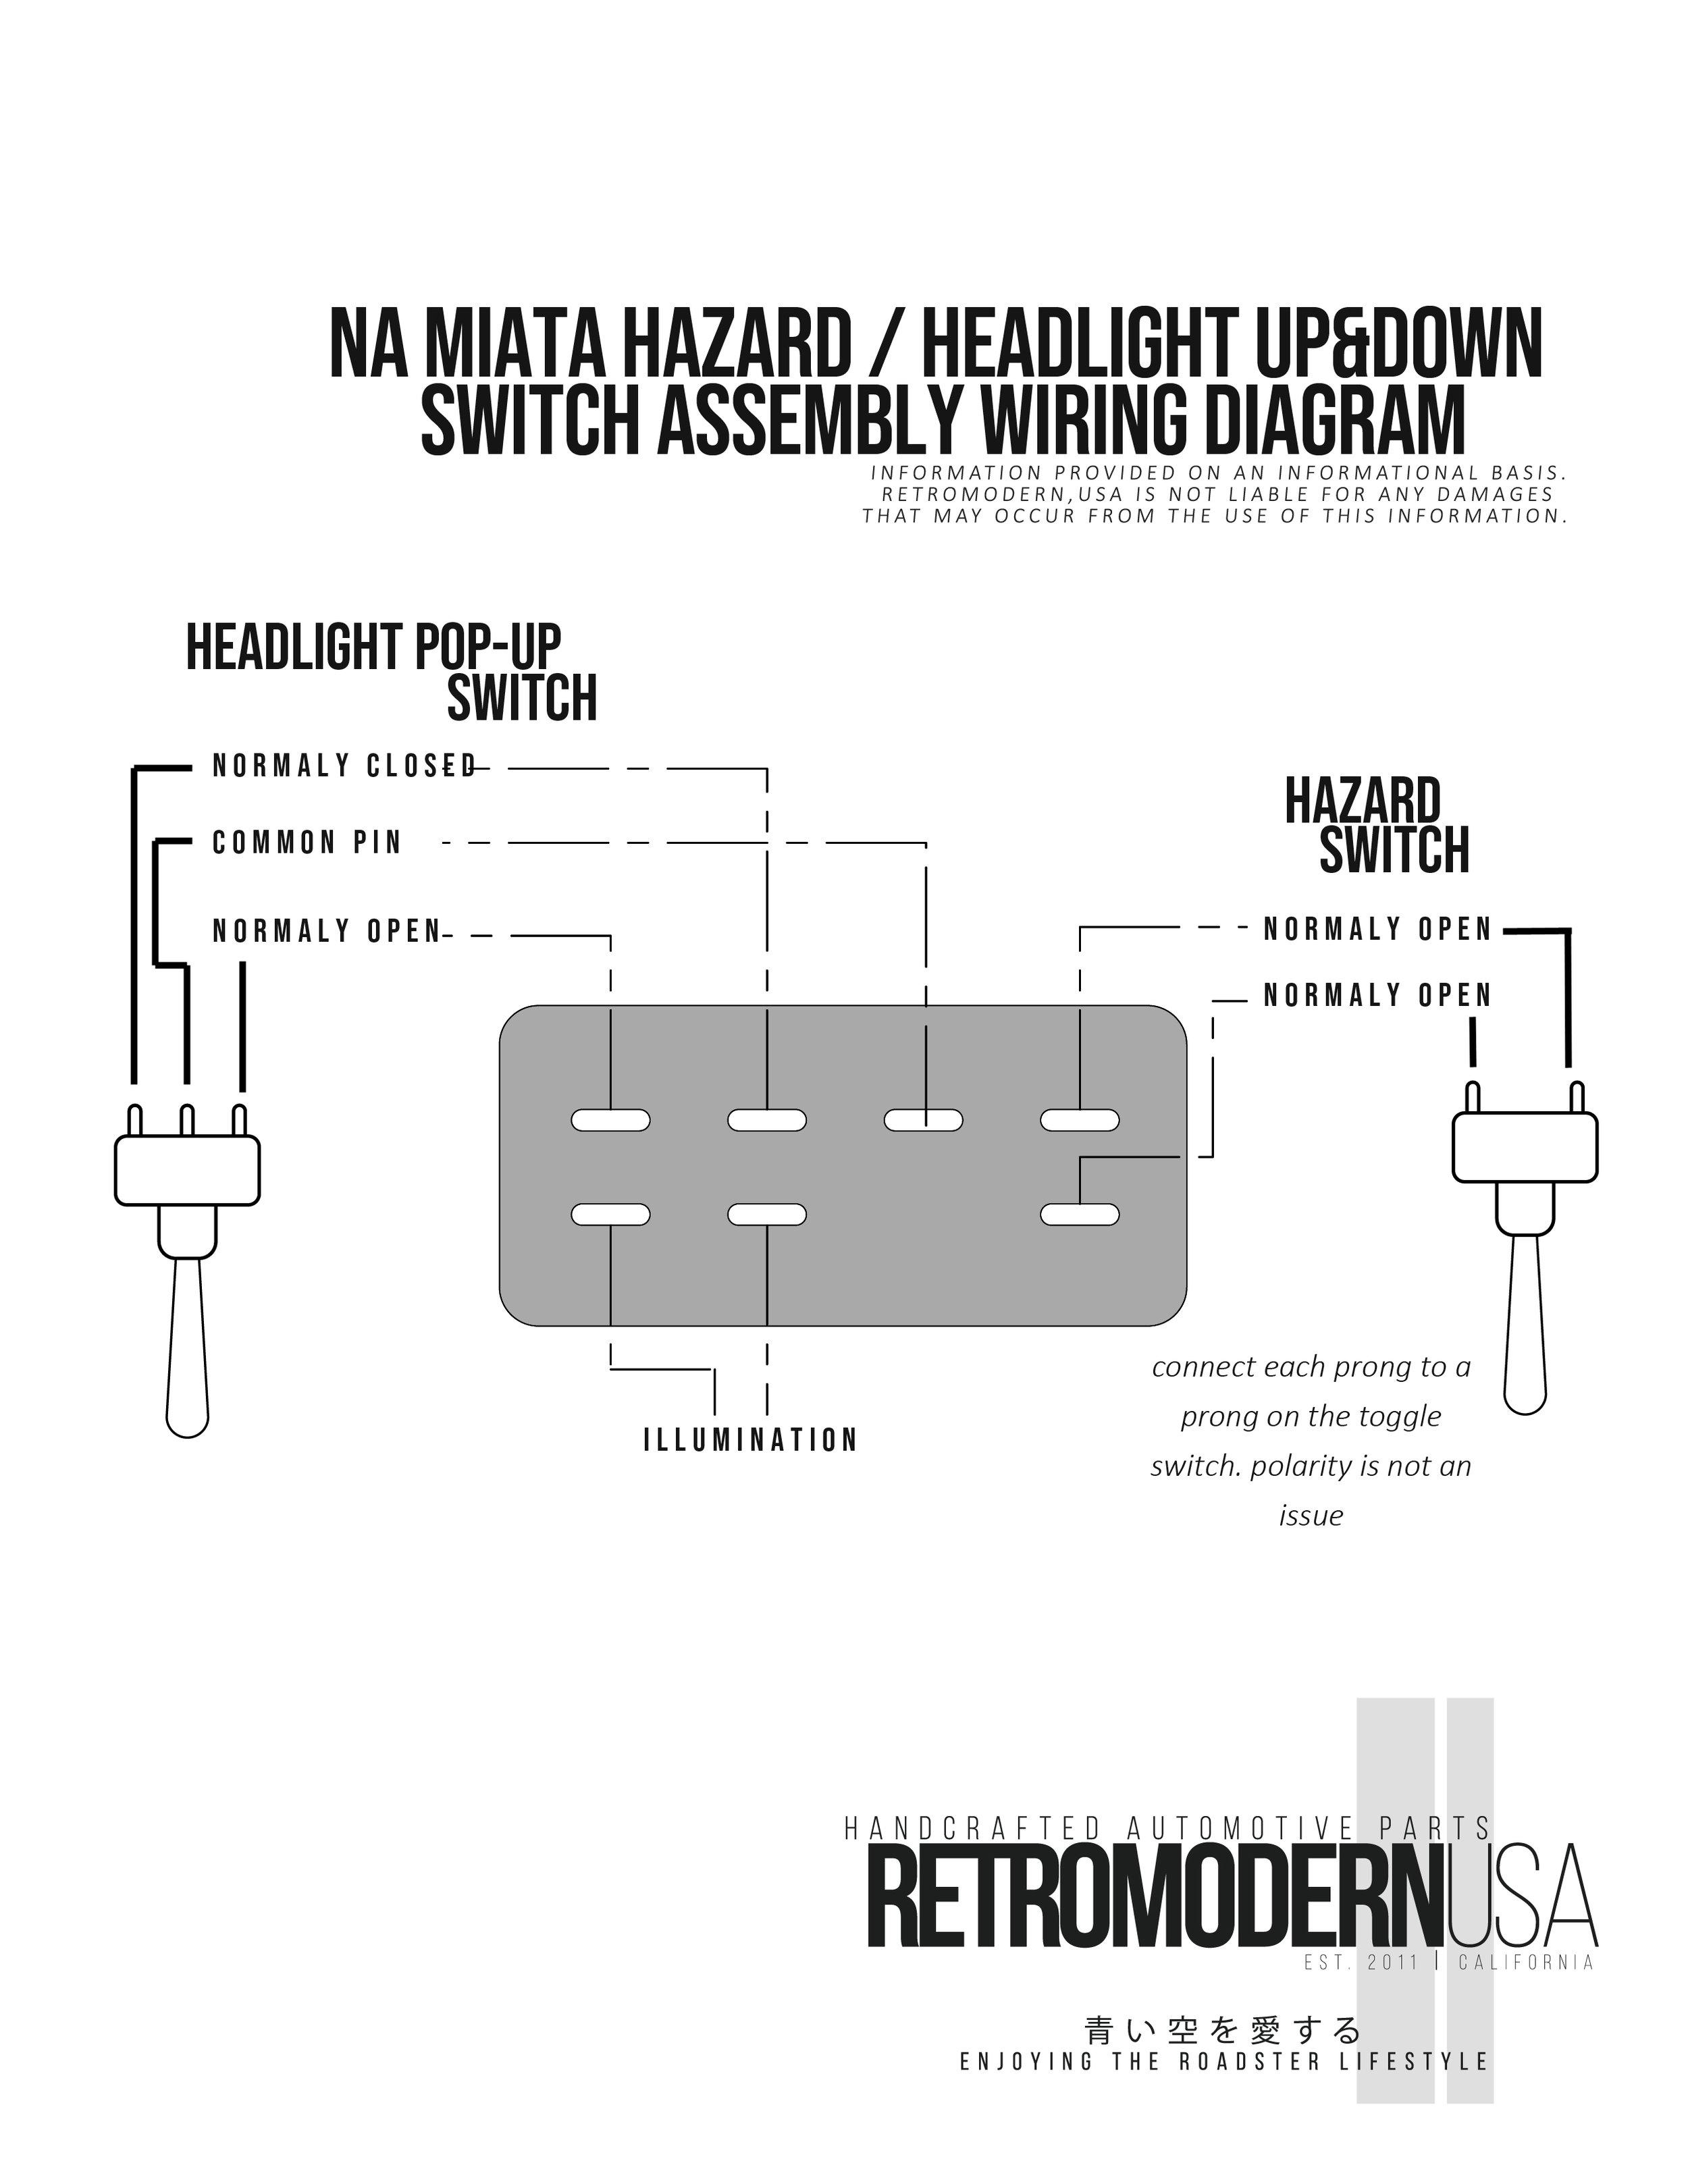 mazda mx5 headlight wiring diagram na pop up   hazard toggle switch assembly wiring diagram  toggle switch assembly wiring diagram